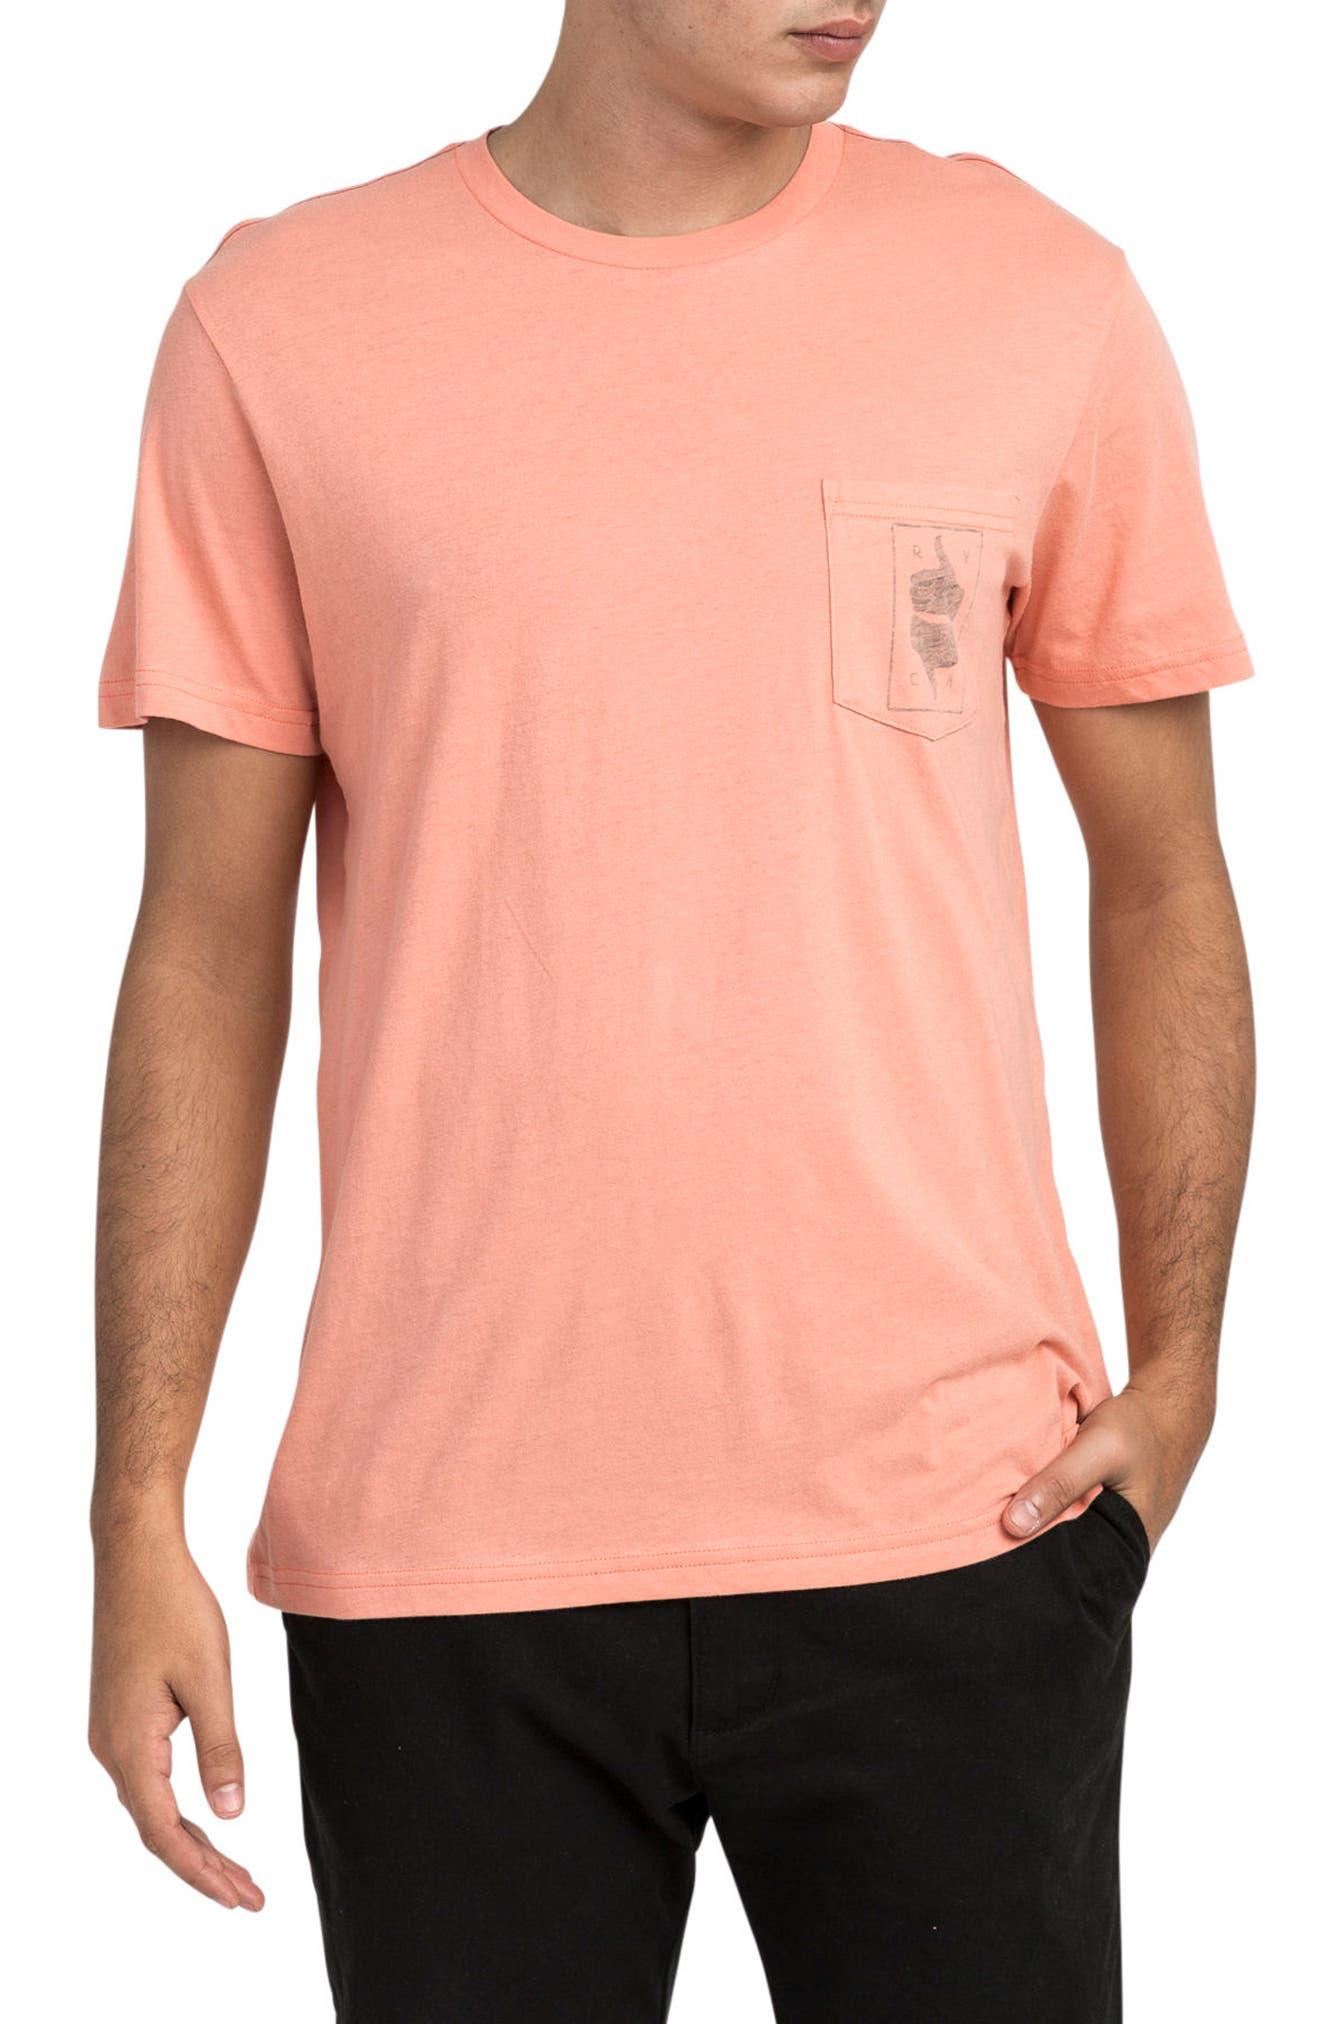 RVCA Thumbs Up T-Shirt